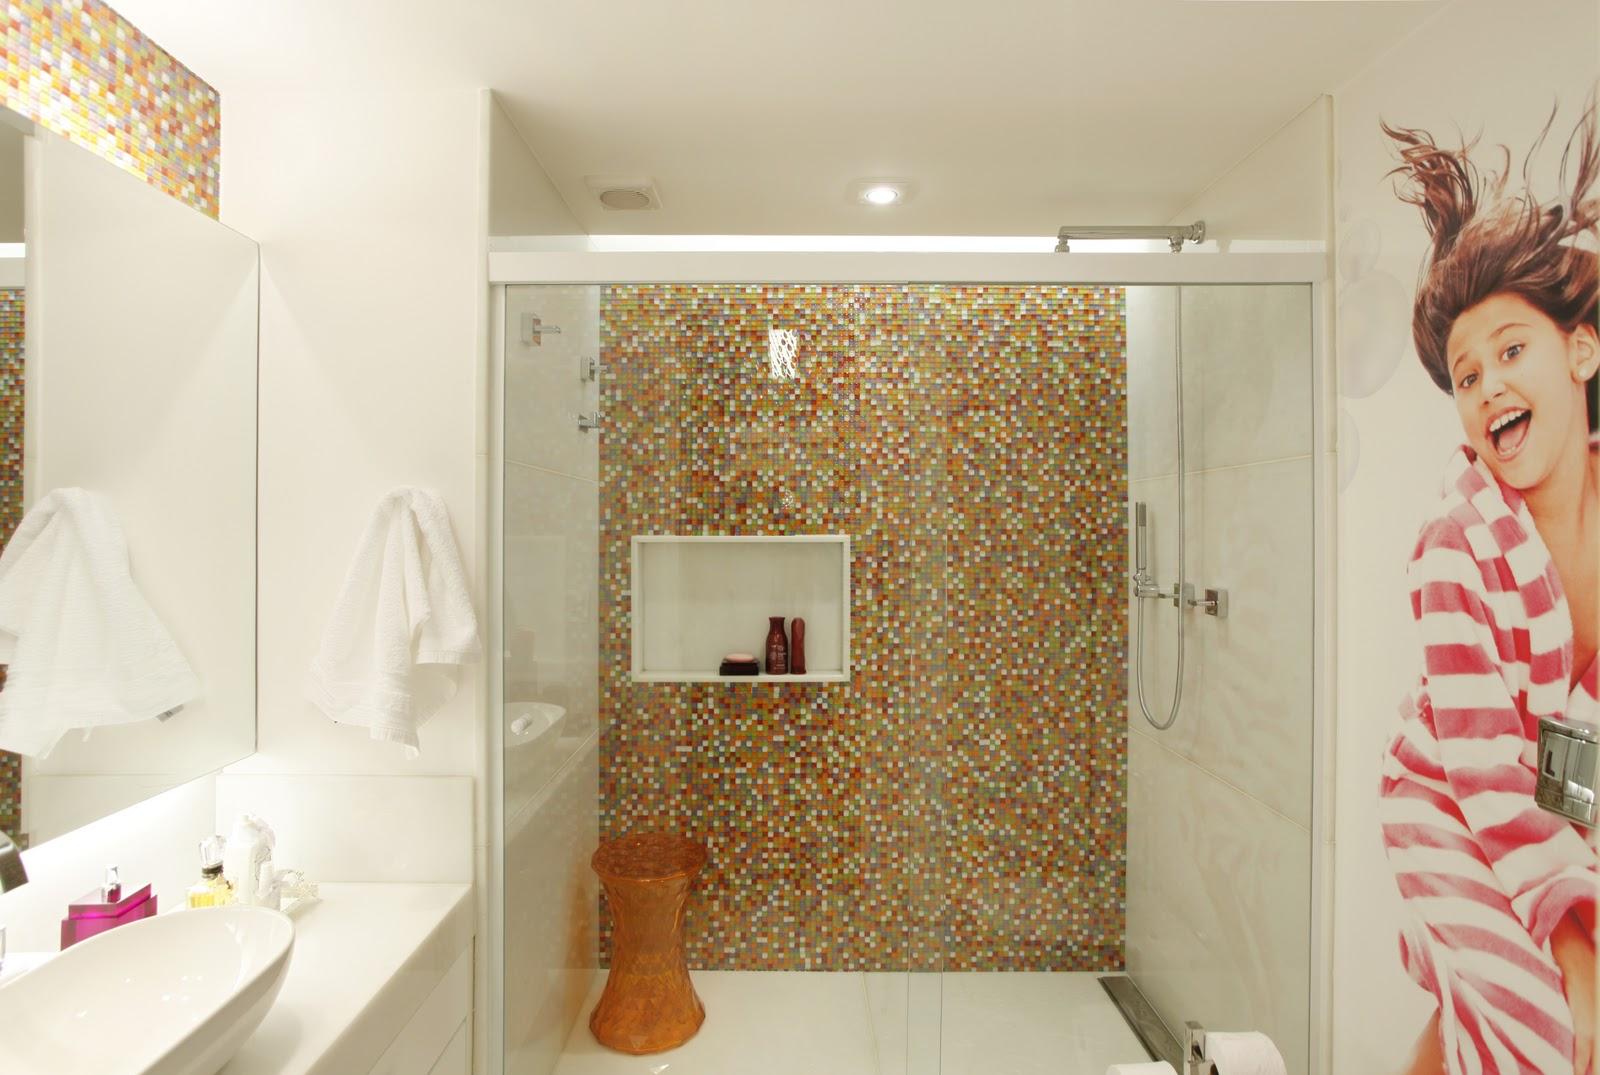 Marcela Sertã e Juliana Giusti Design de Interiores: BANHEIRO MENINA #9B3050 1600 1075